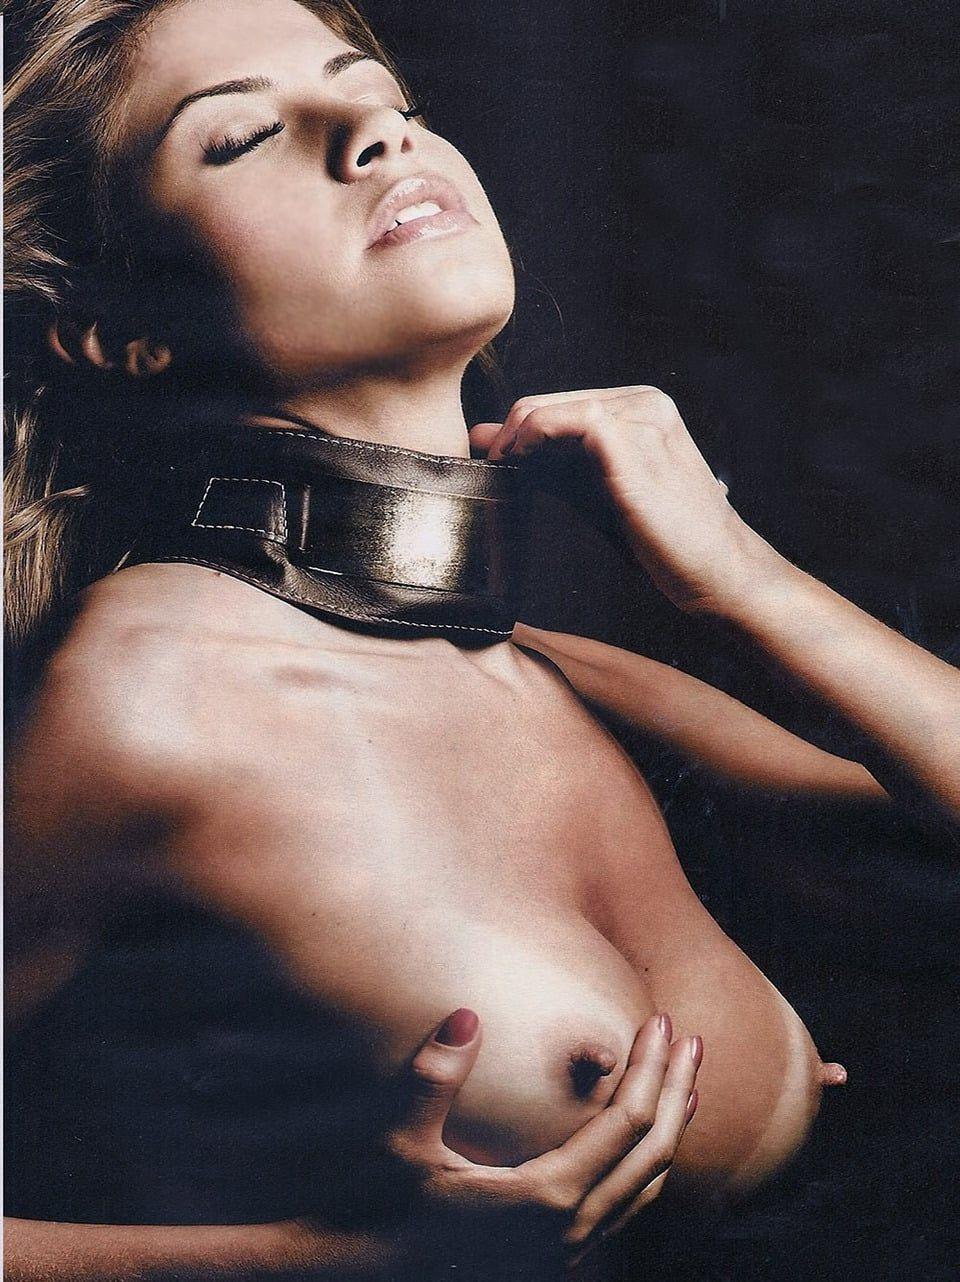 Consider, Vita c xxx hard nipples that